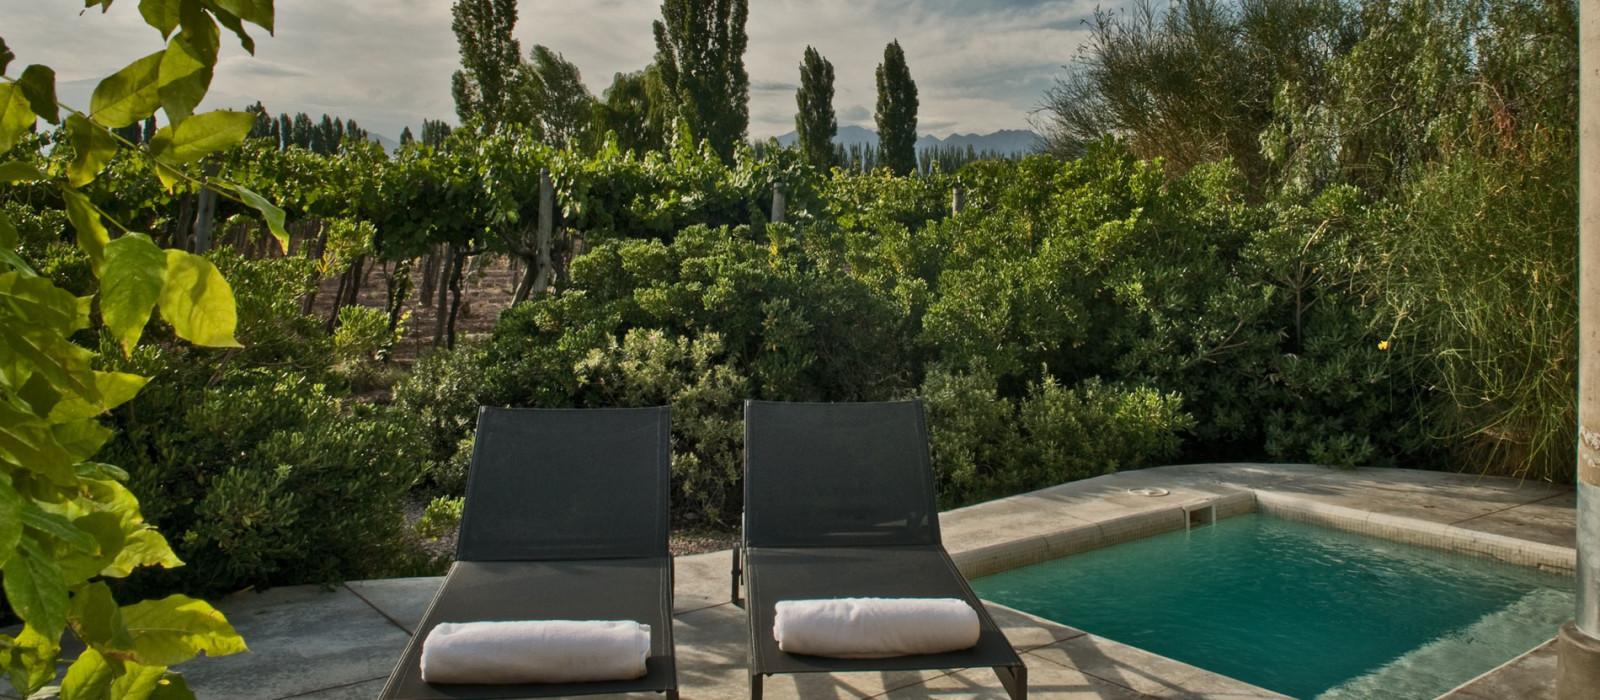 Hotel Cavas Wine Lodge Argentina